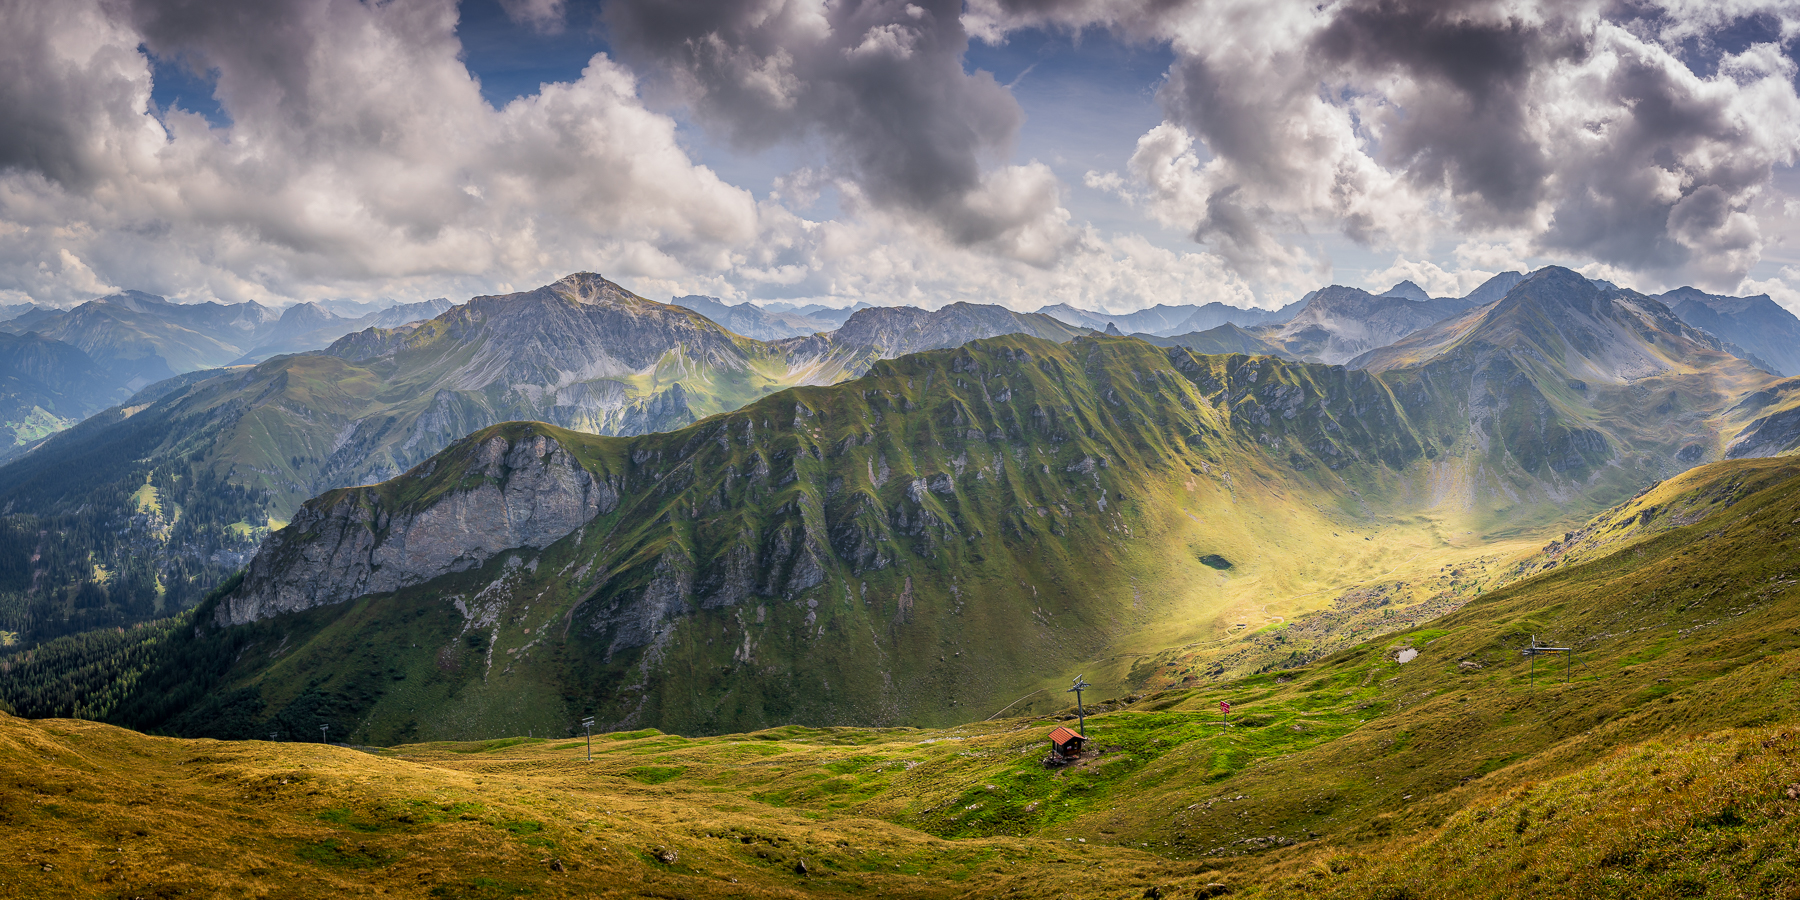 Bild Nr. 2020_7882: Graubündner Bergpanorama